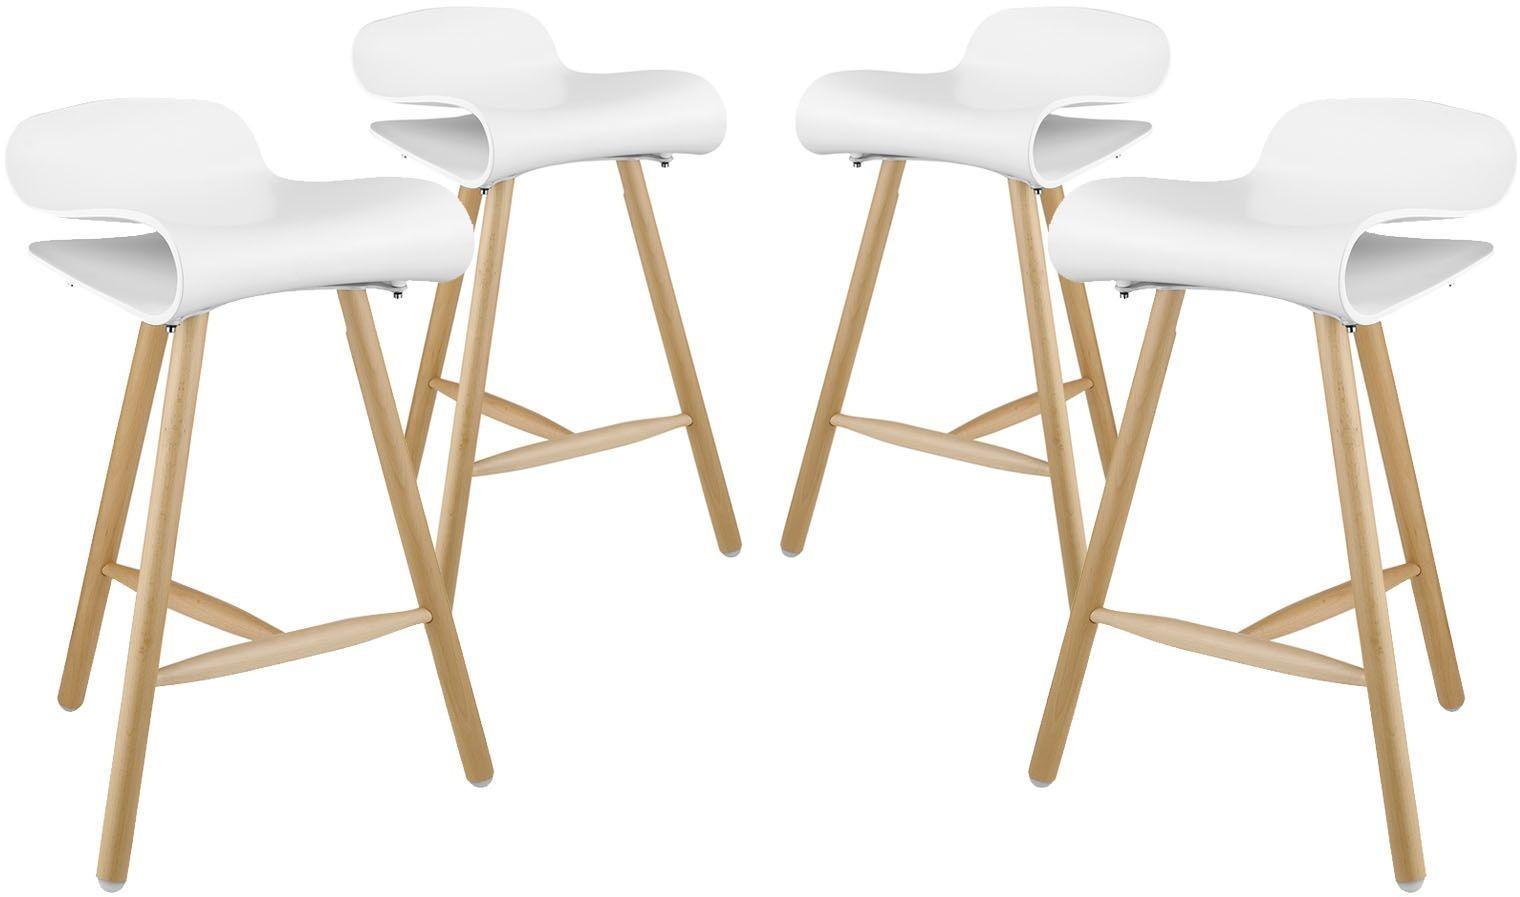 Clip White Bar Stool Set of 4 EEI 2406 WHI SET Renegade  : eei 2406 whi set1eei from colemanfurniture.com size 1520 x 897 jpeg 95kB